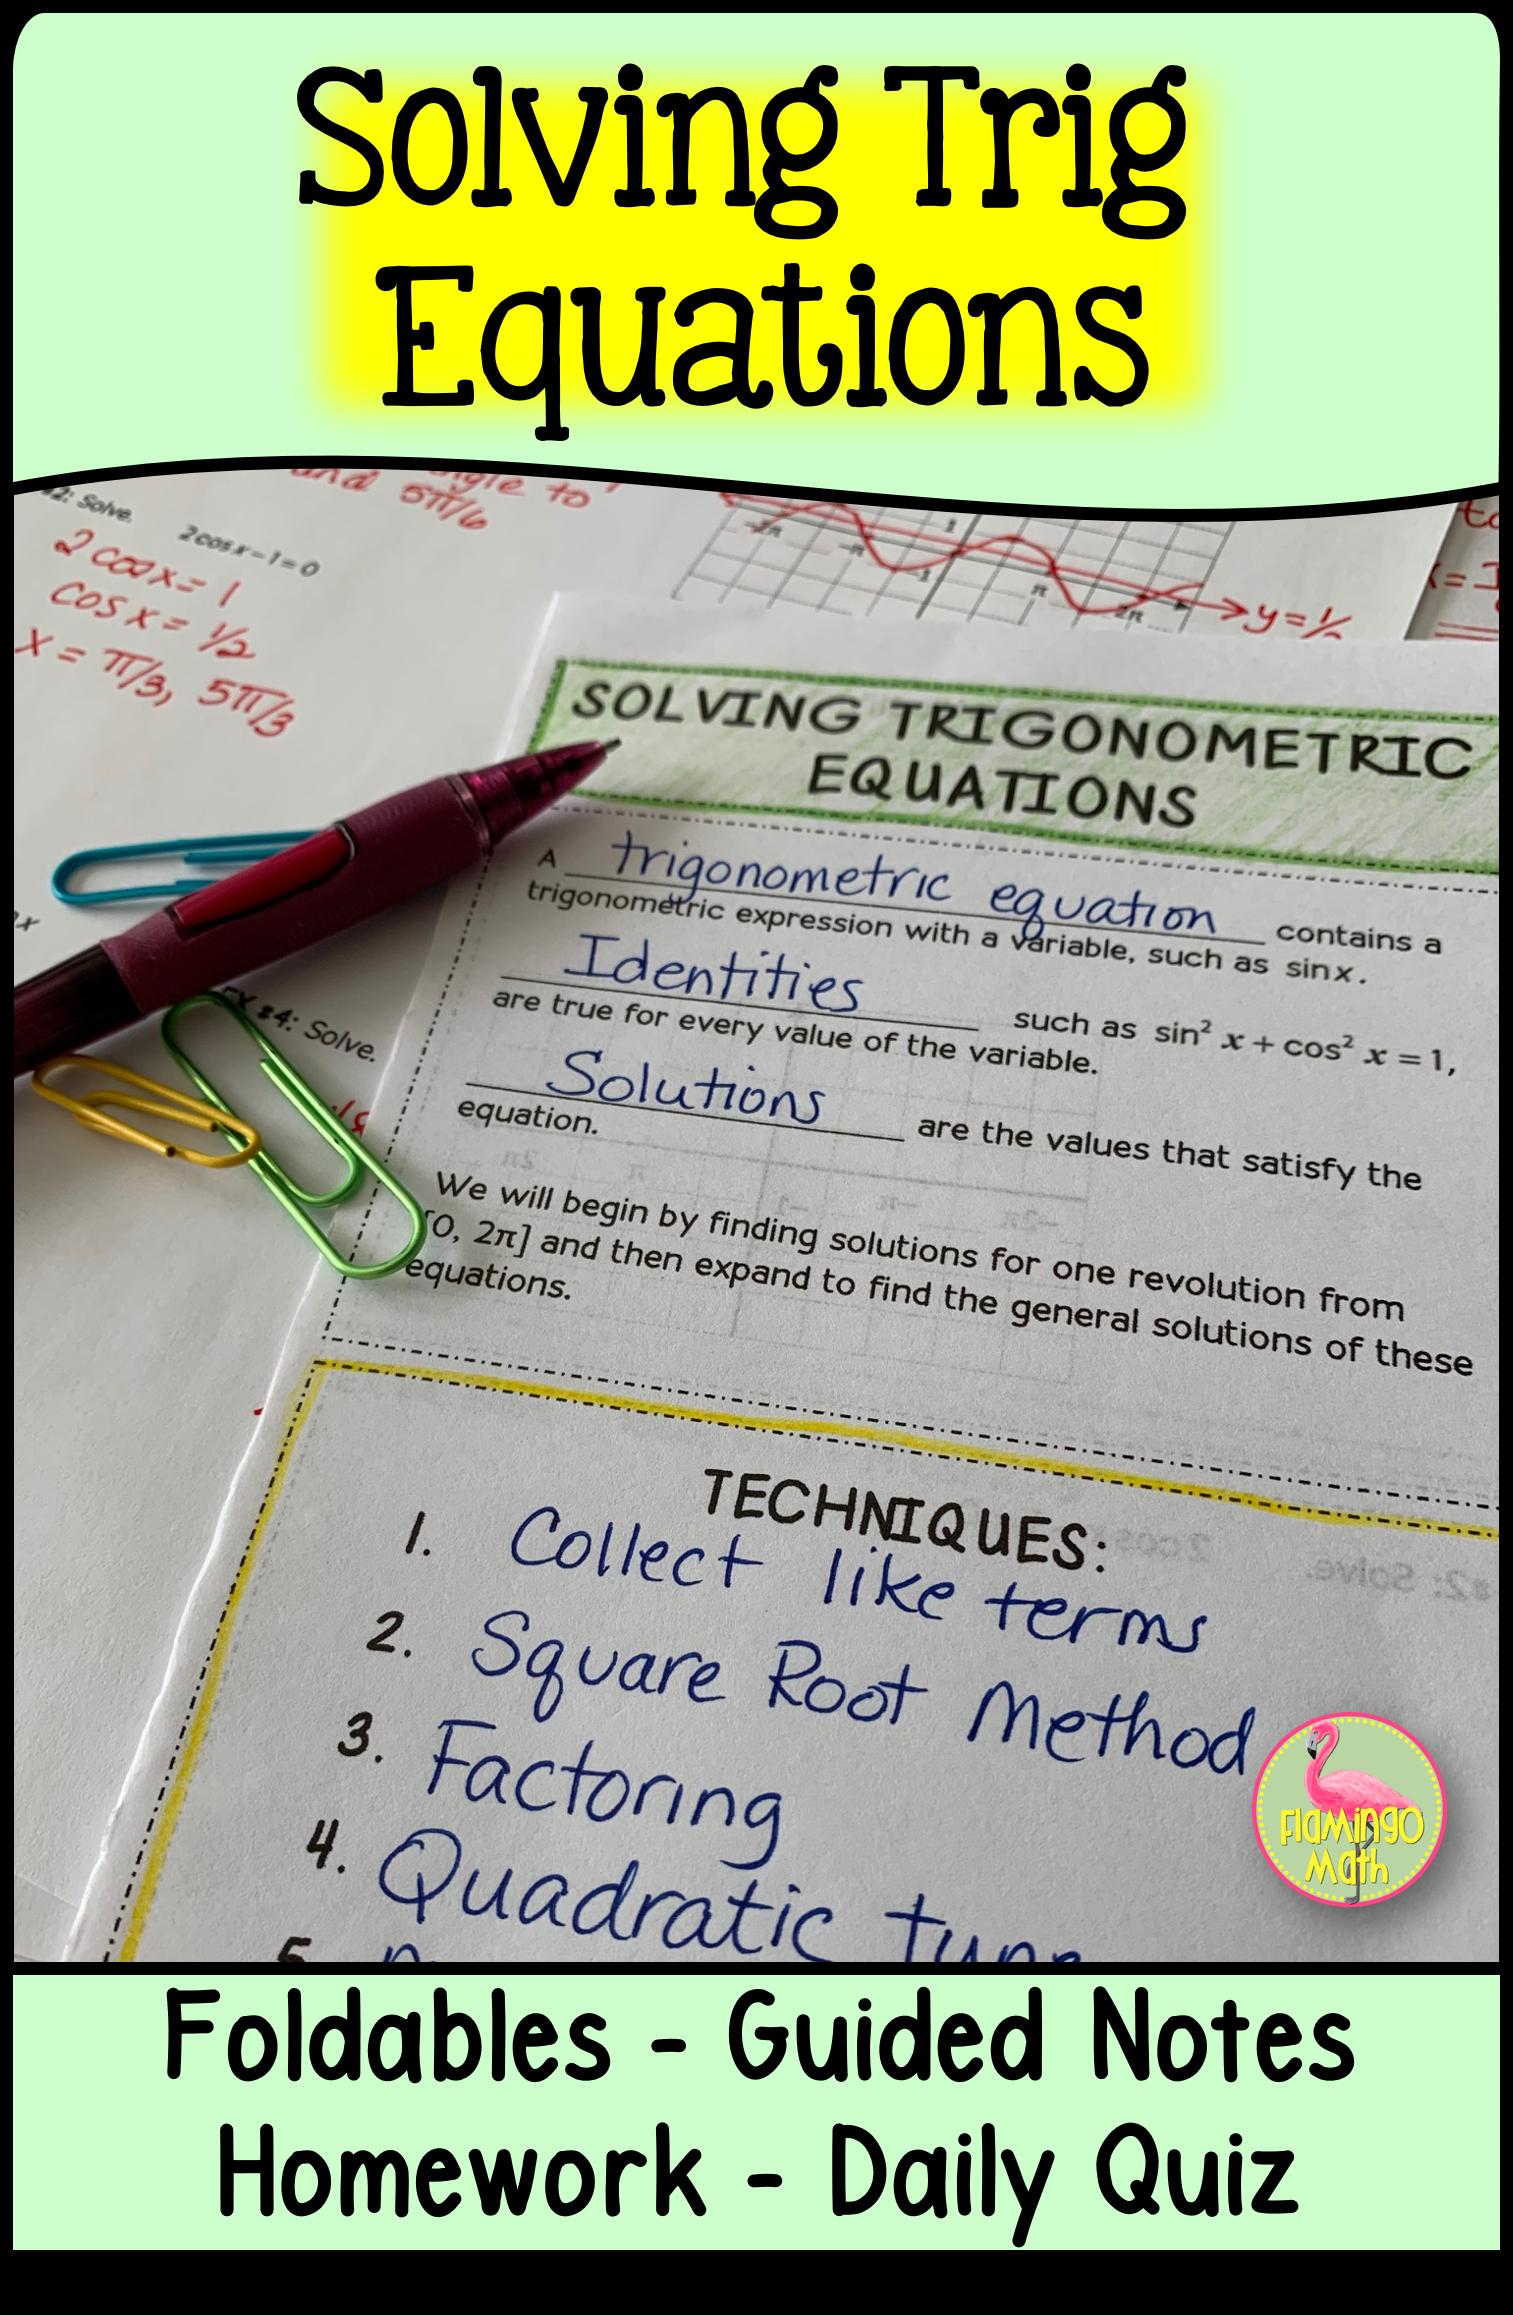 Solving Trigonometric Equations Precalculus